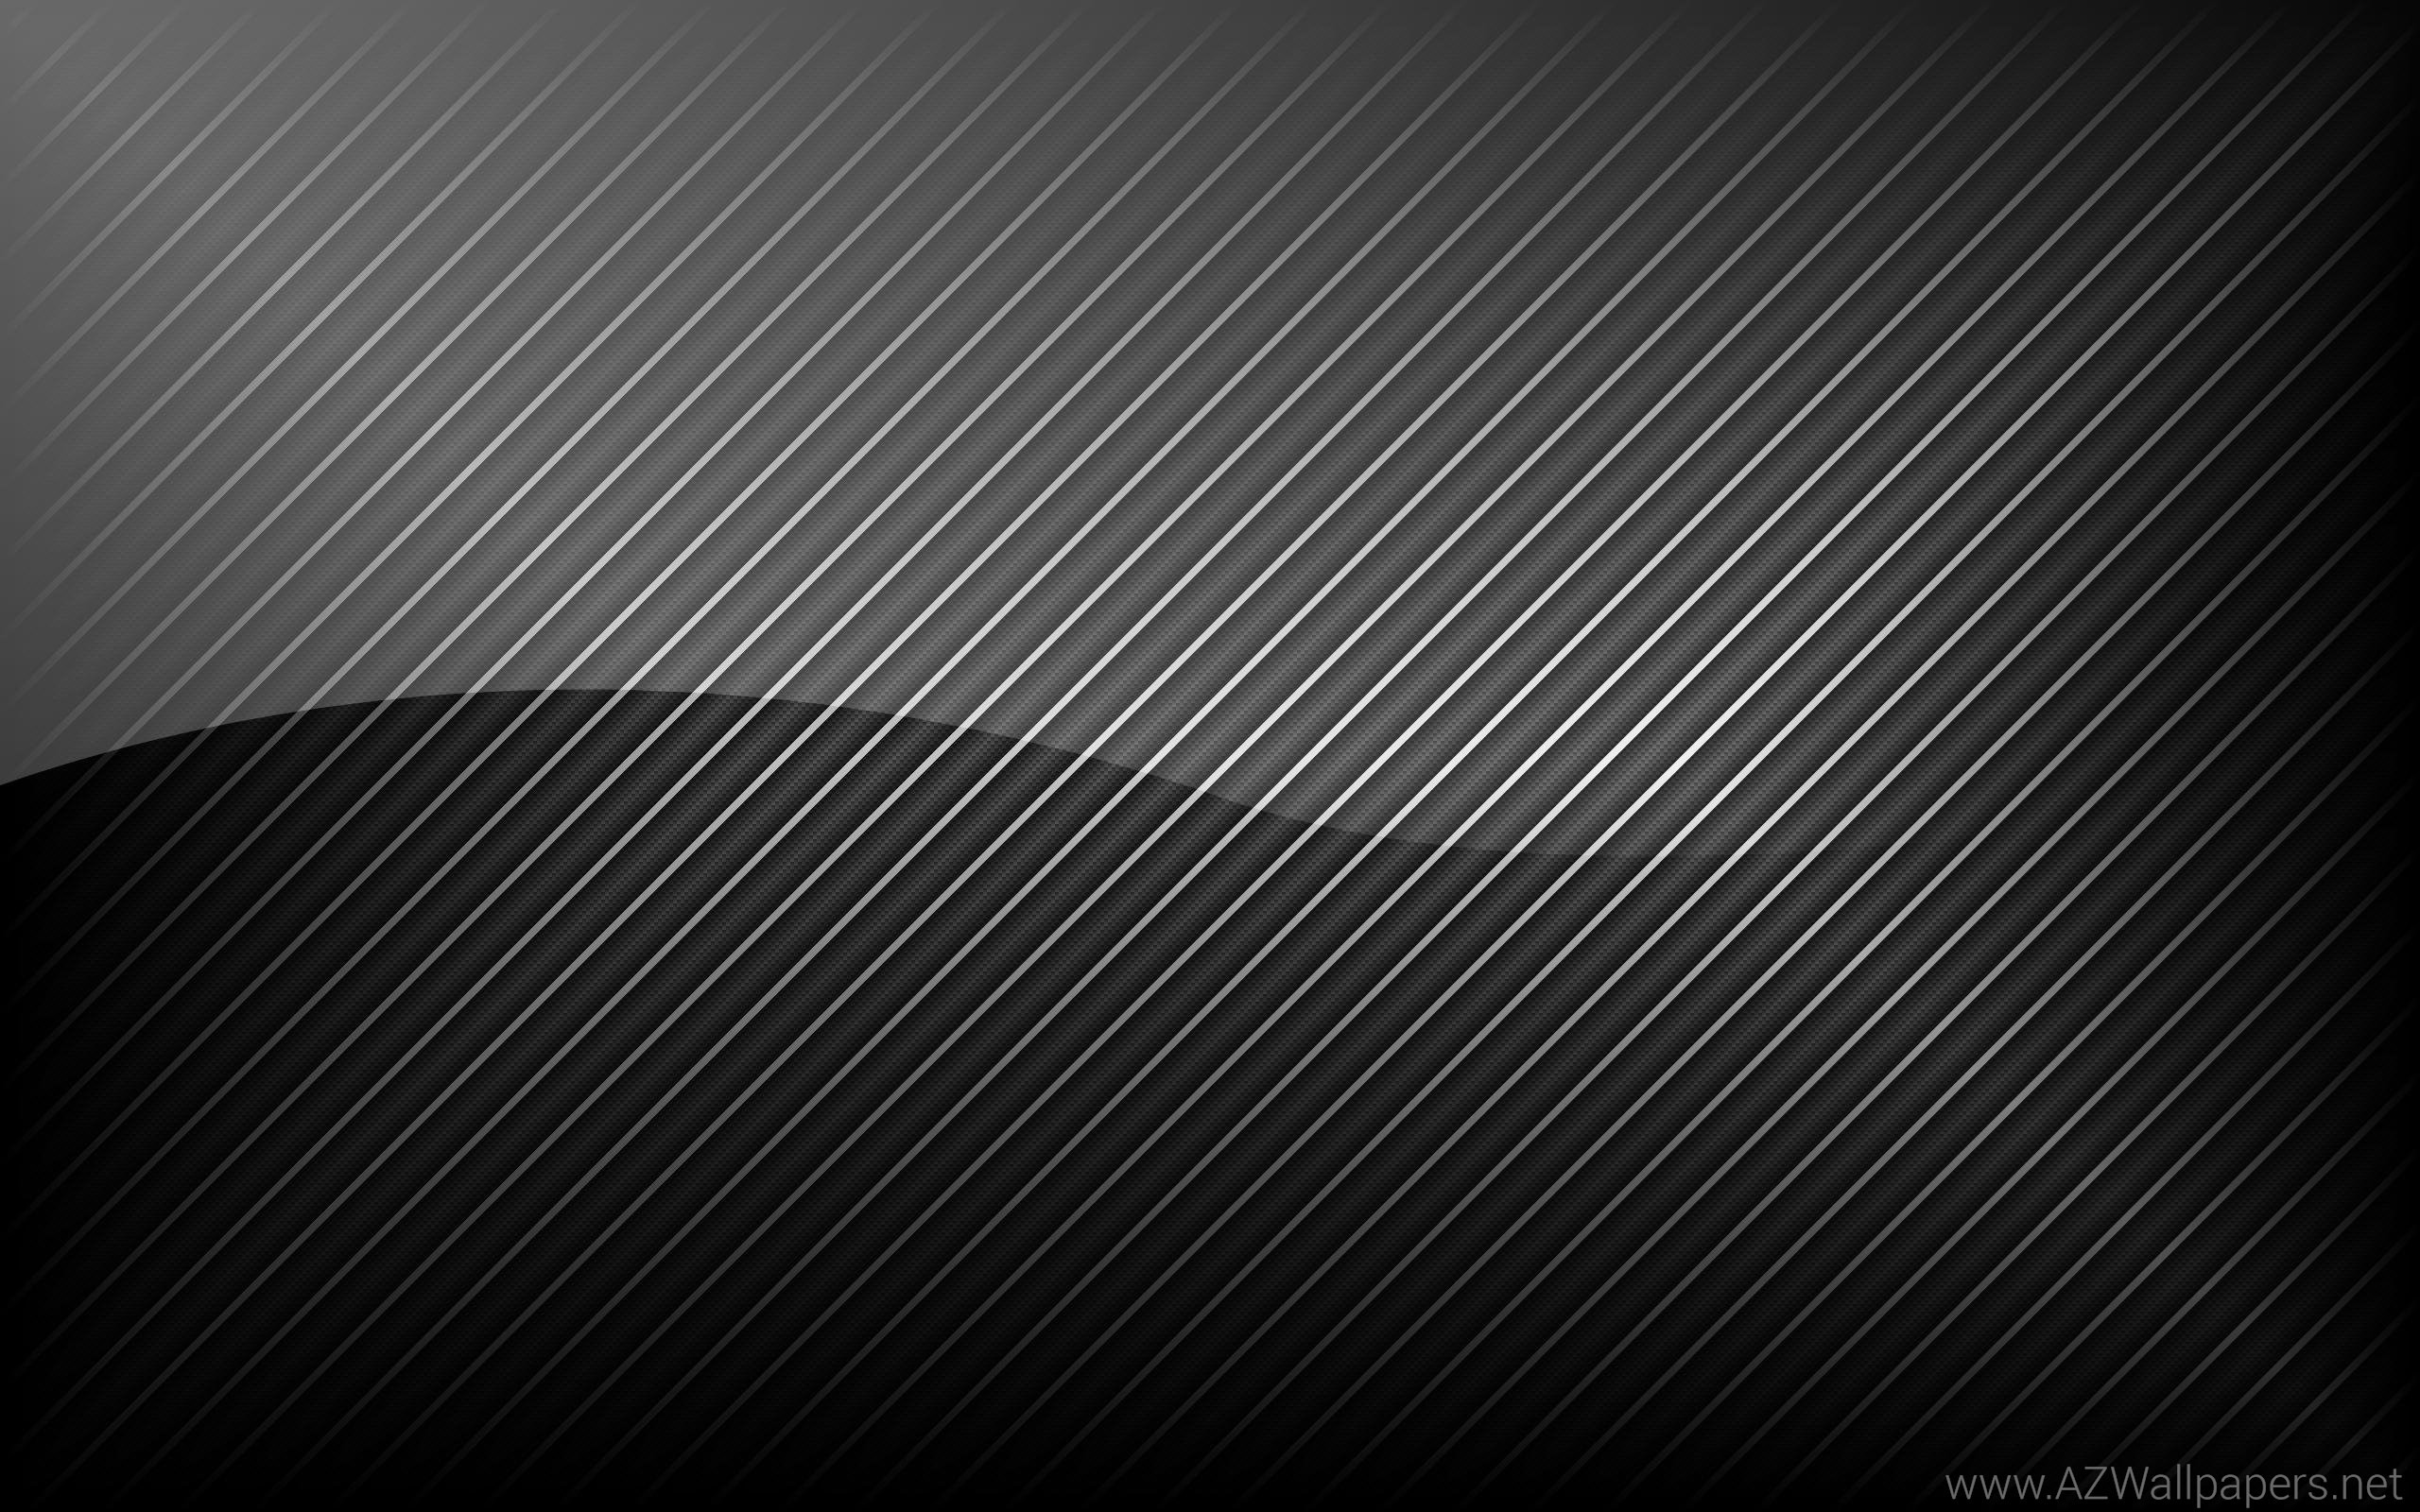 Descargar 1920x1080 Koenigsegg Logo De Fibra De Carbono Hd